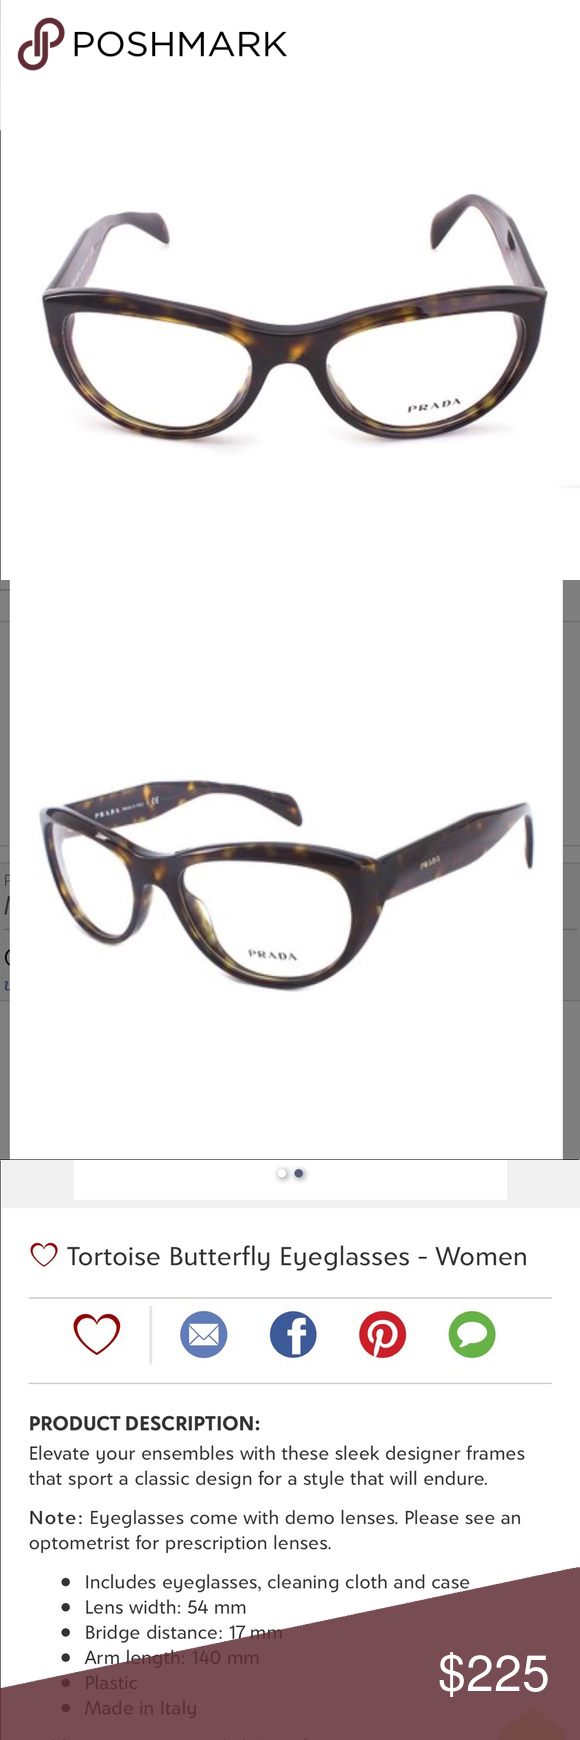 1c8fa37b32fb ... this listing on Poshmark  Prada Tortoise Butterfly Eyeglasses Brand new.   shopmycloset  poshmark  fashion  shopping  style  forsale  Prada   Accessories